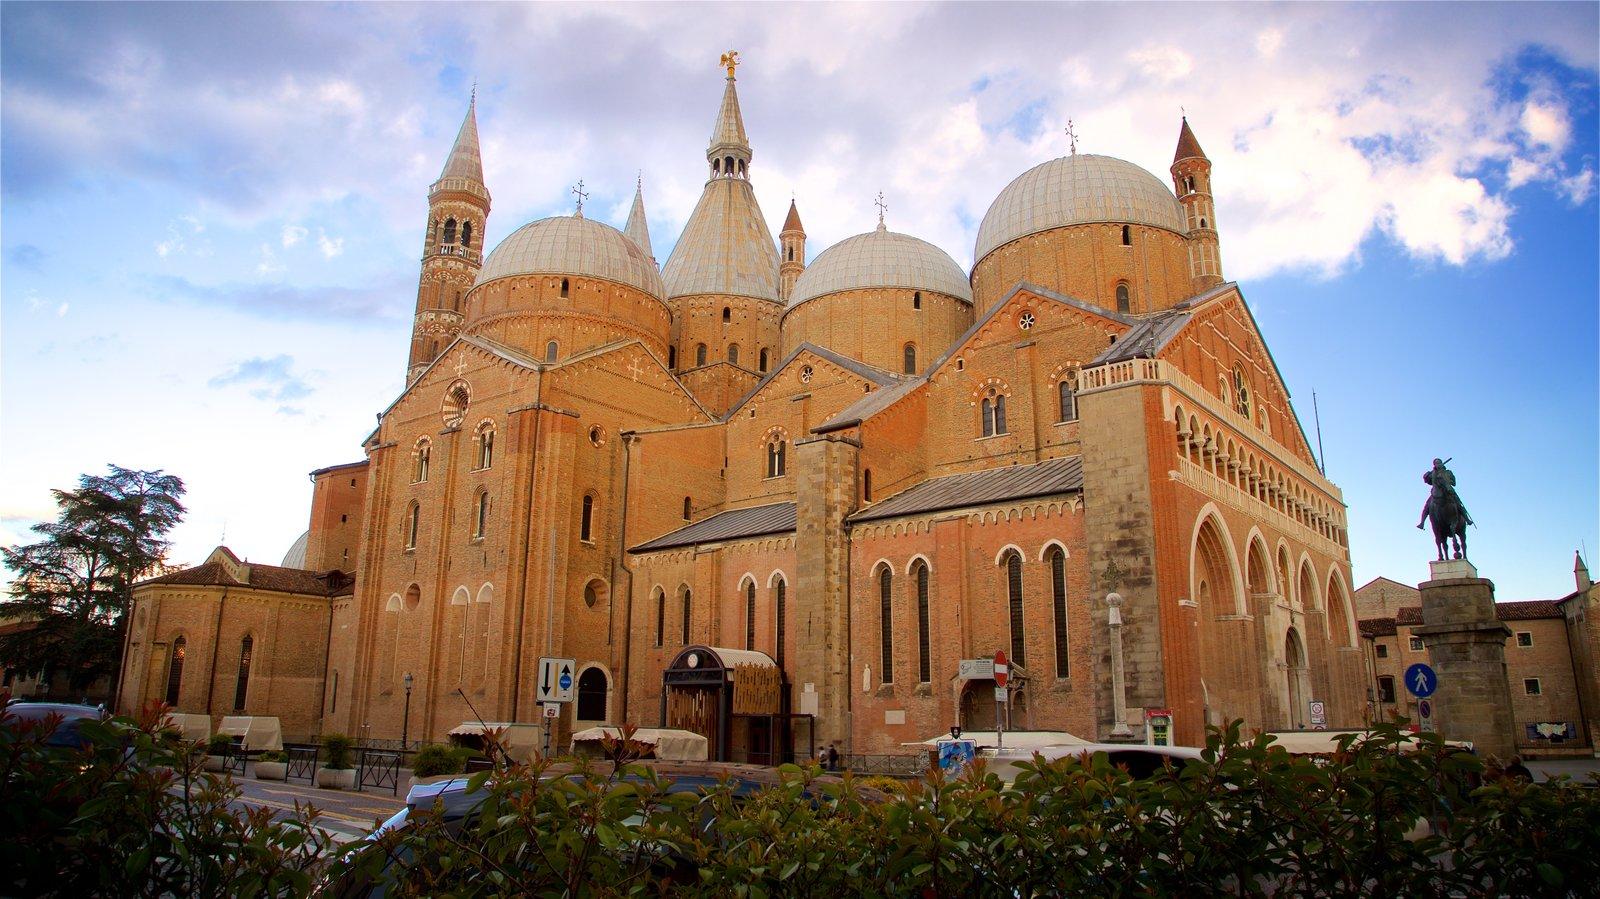 Basilica di Sant\'Antonio da Padova which includes a church or cathedral, a sunset and heritage architecture